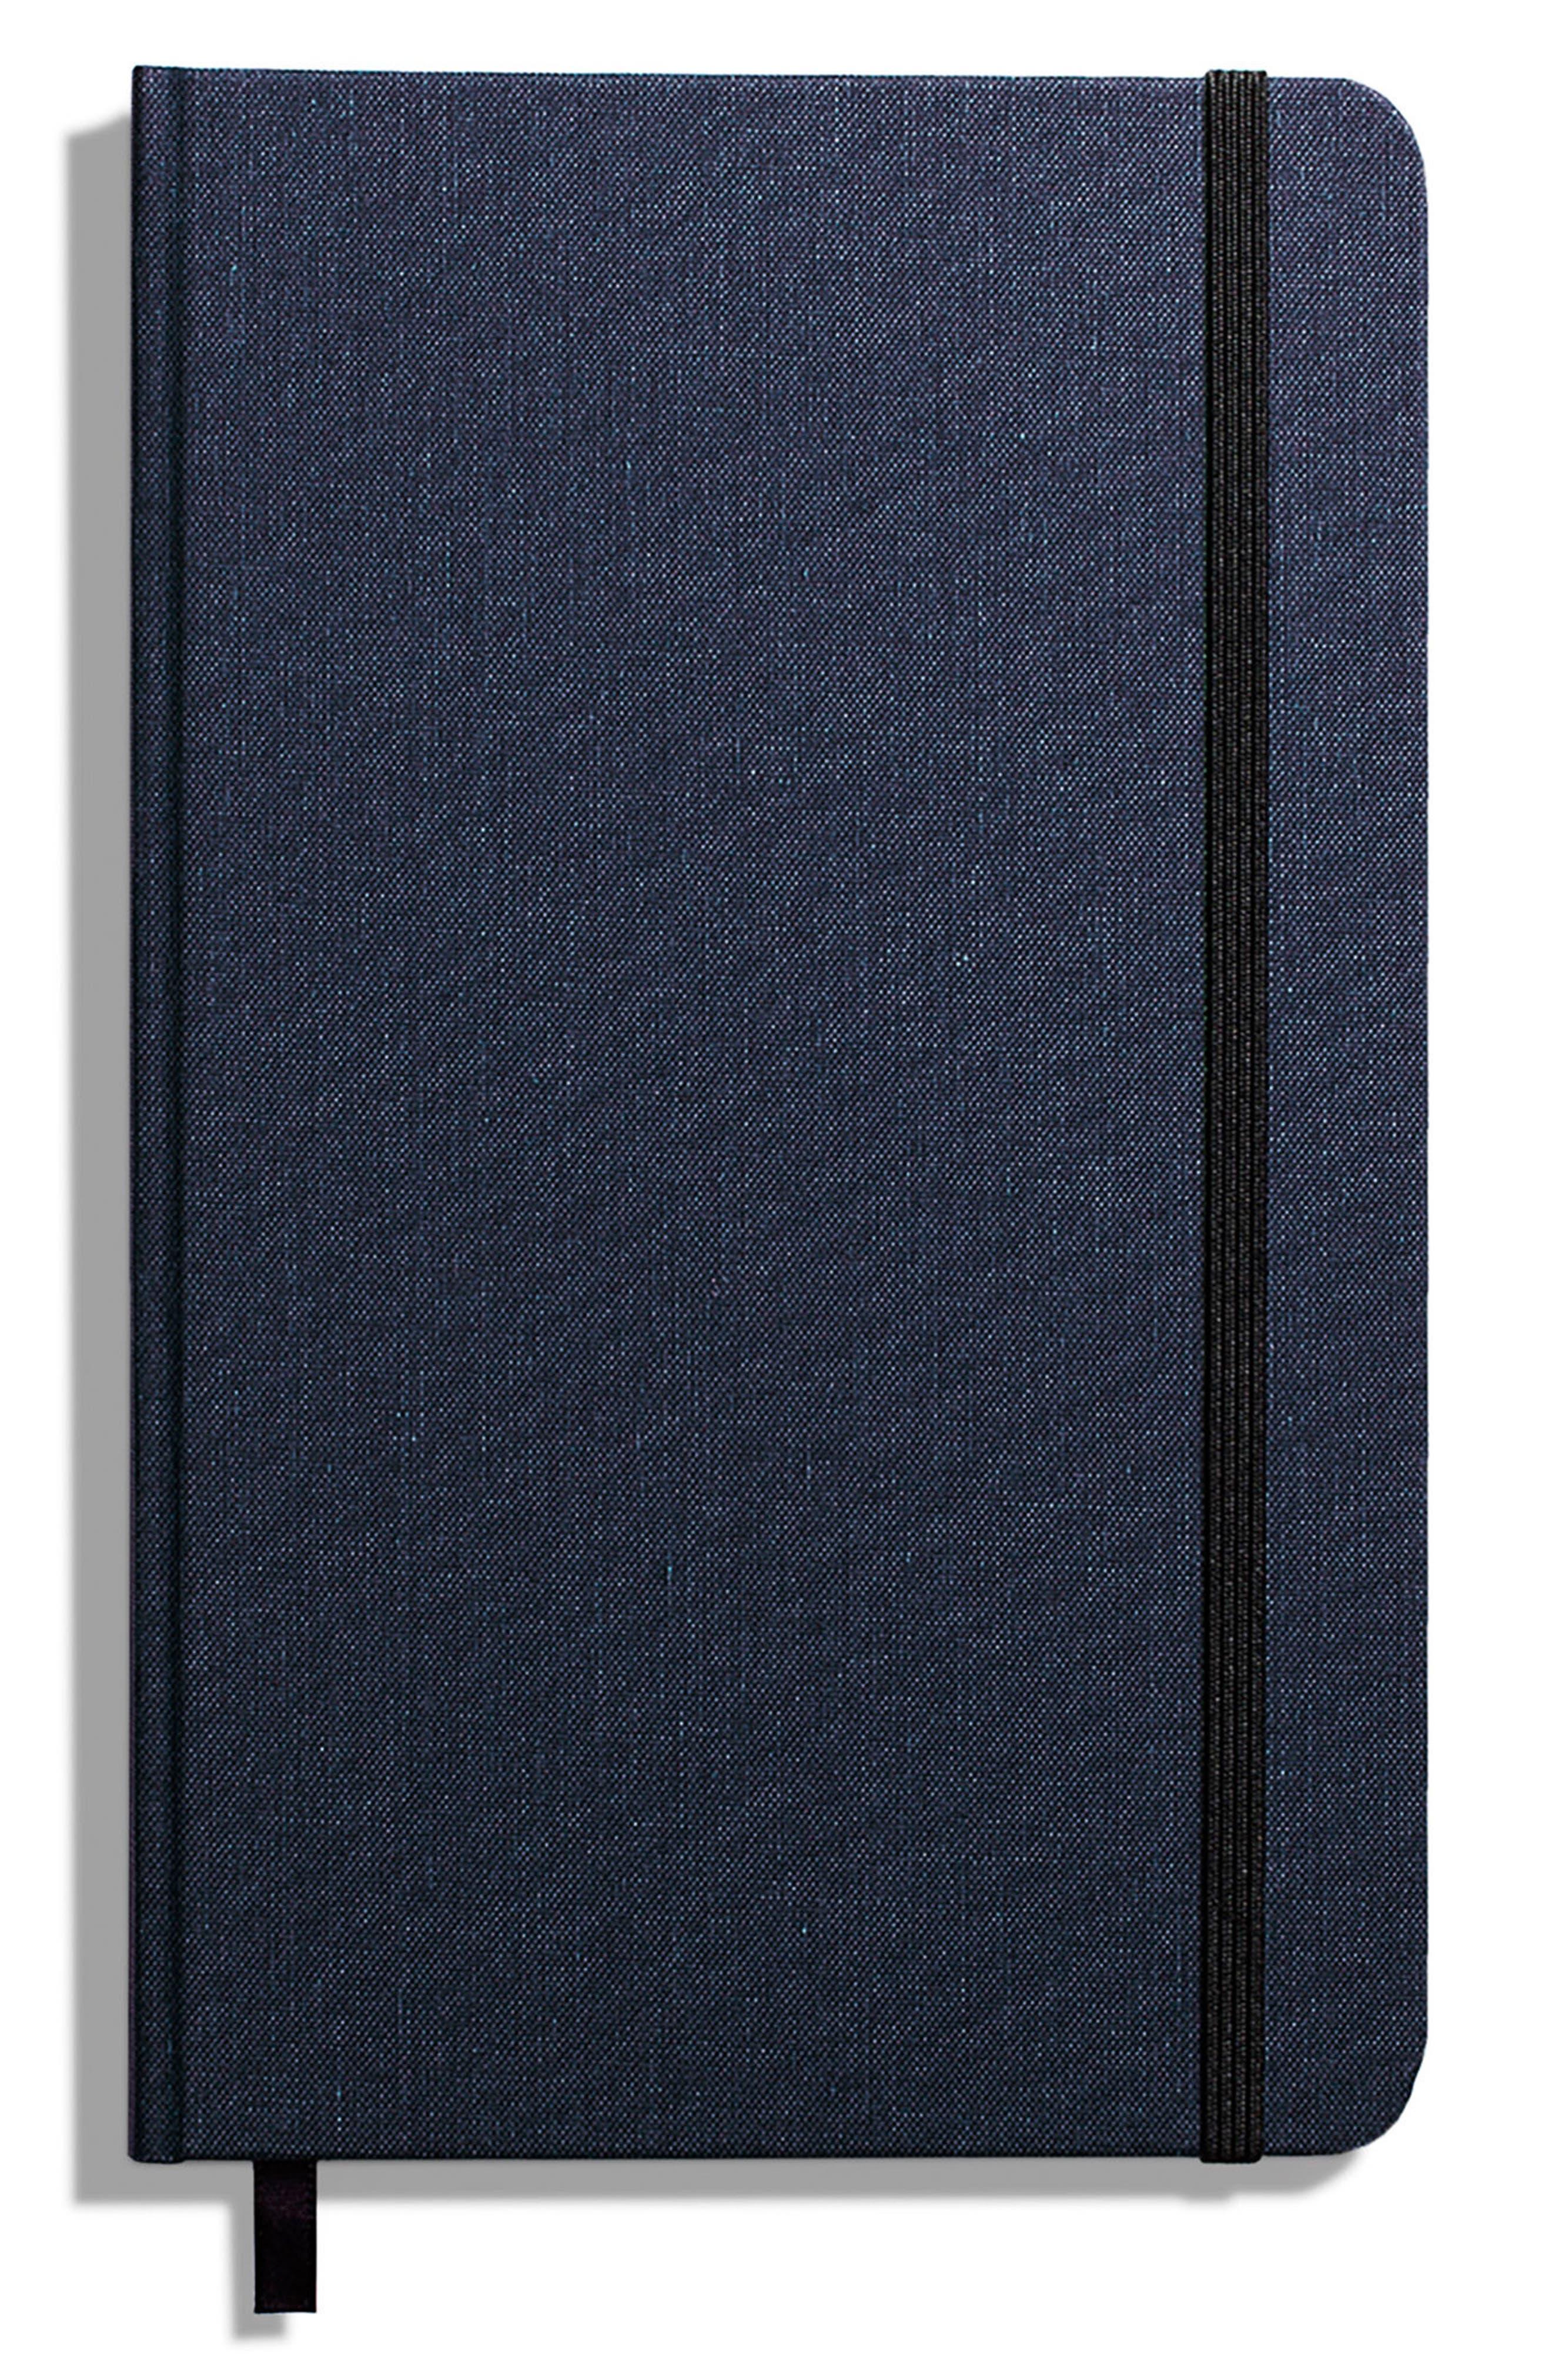 Hardcover Linen Journal,                             Main thumbnail 1, color,                             NAVY